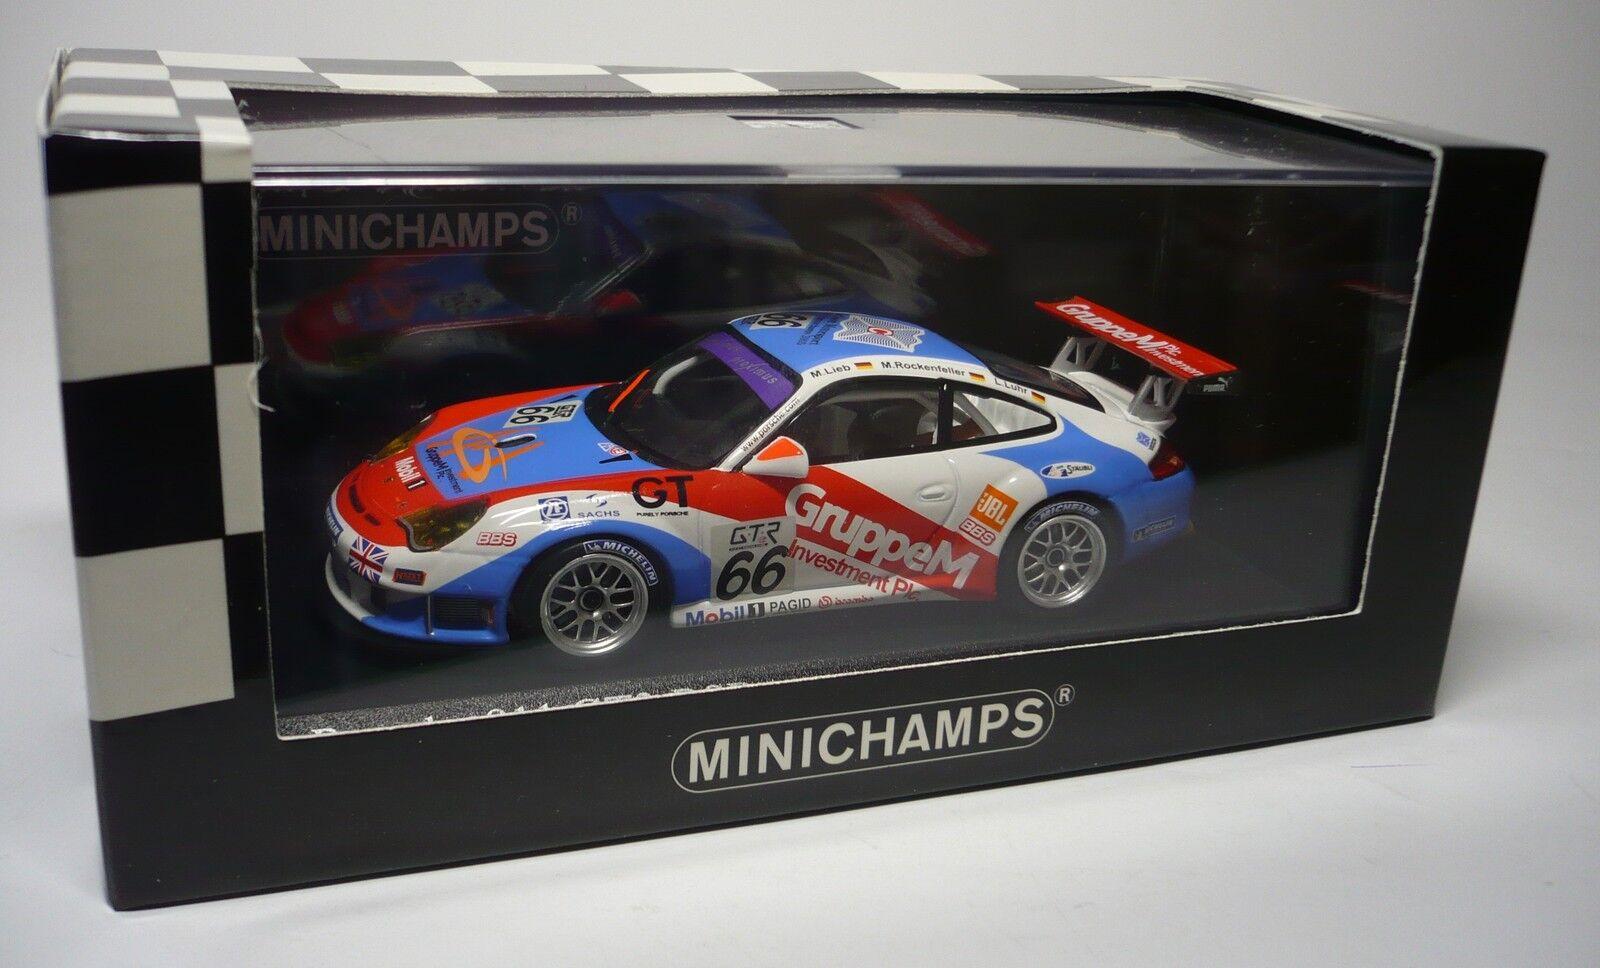 1 PORSCHE 911 GT3 RSR SPA 2005 1 43 MINICHAMPS